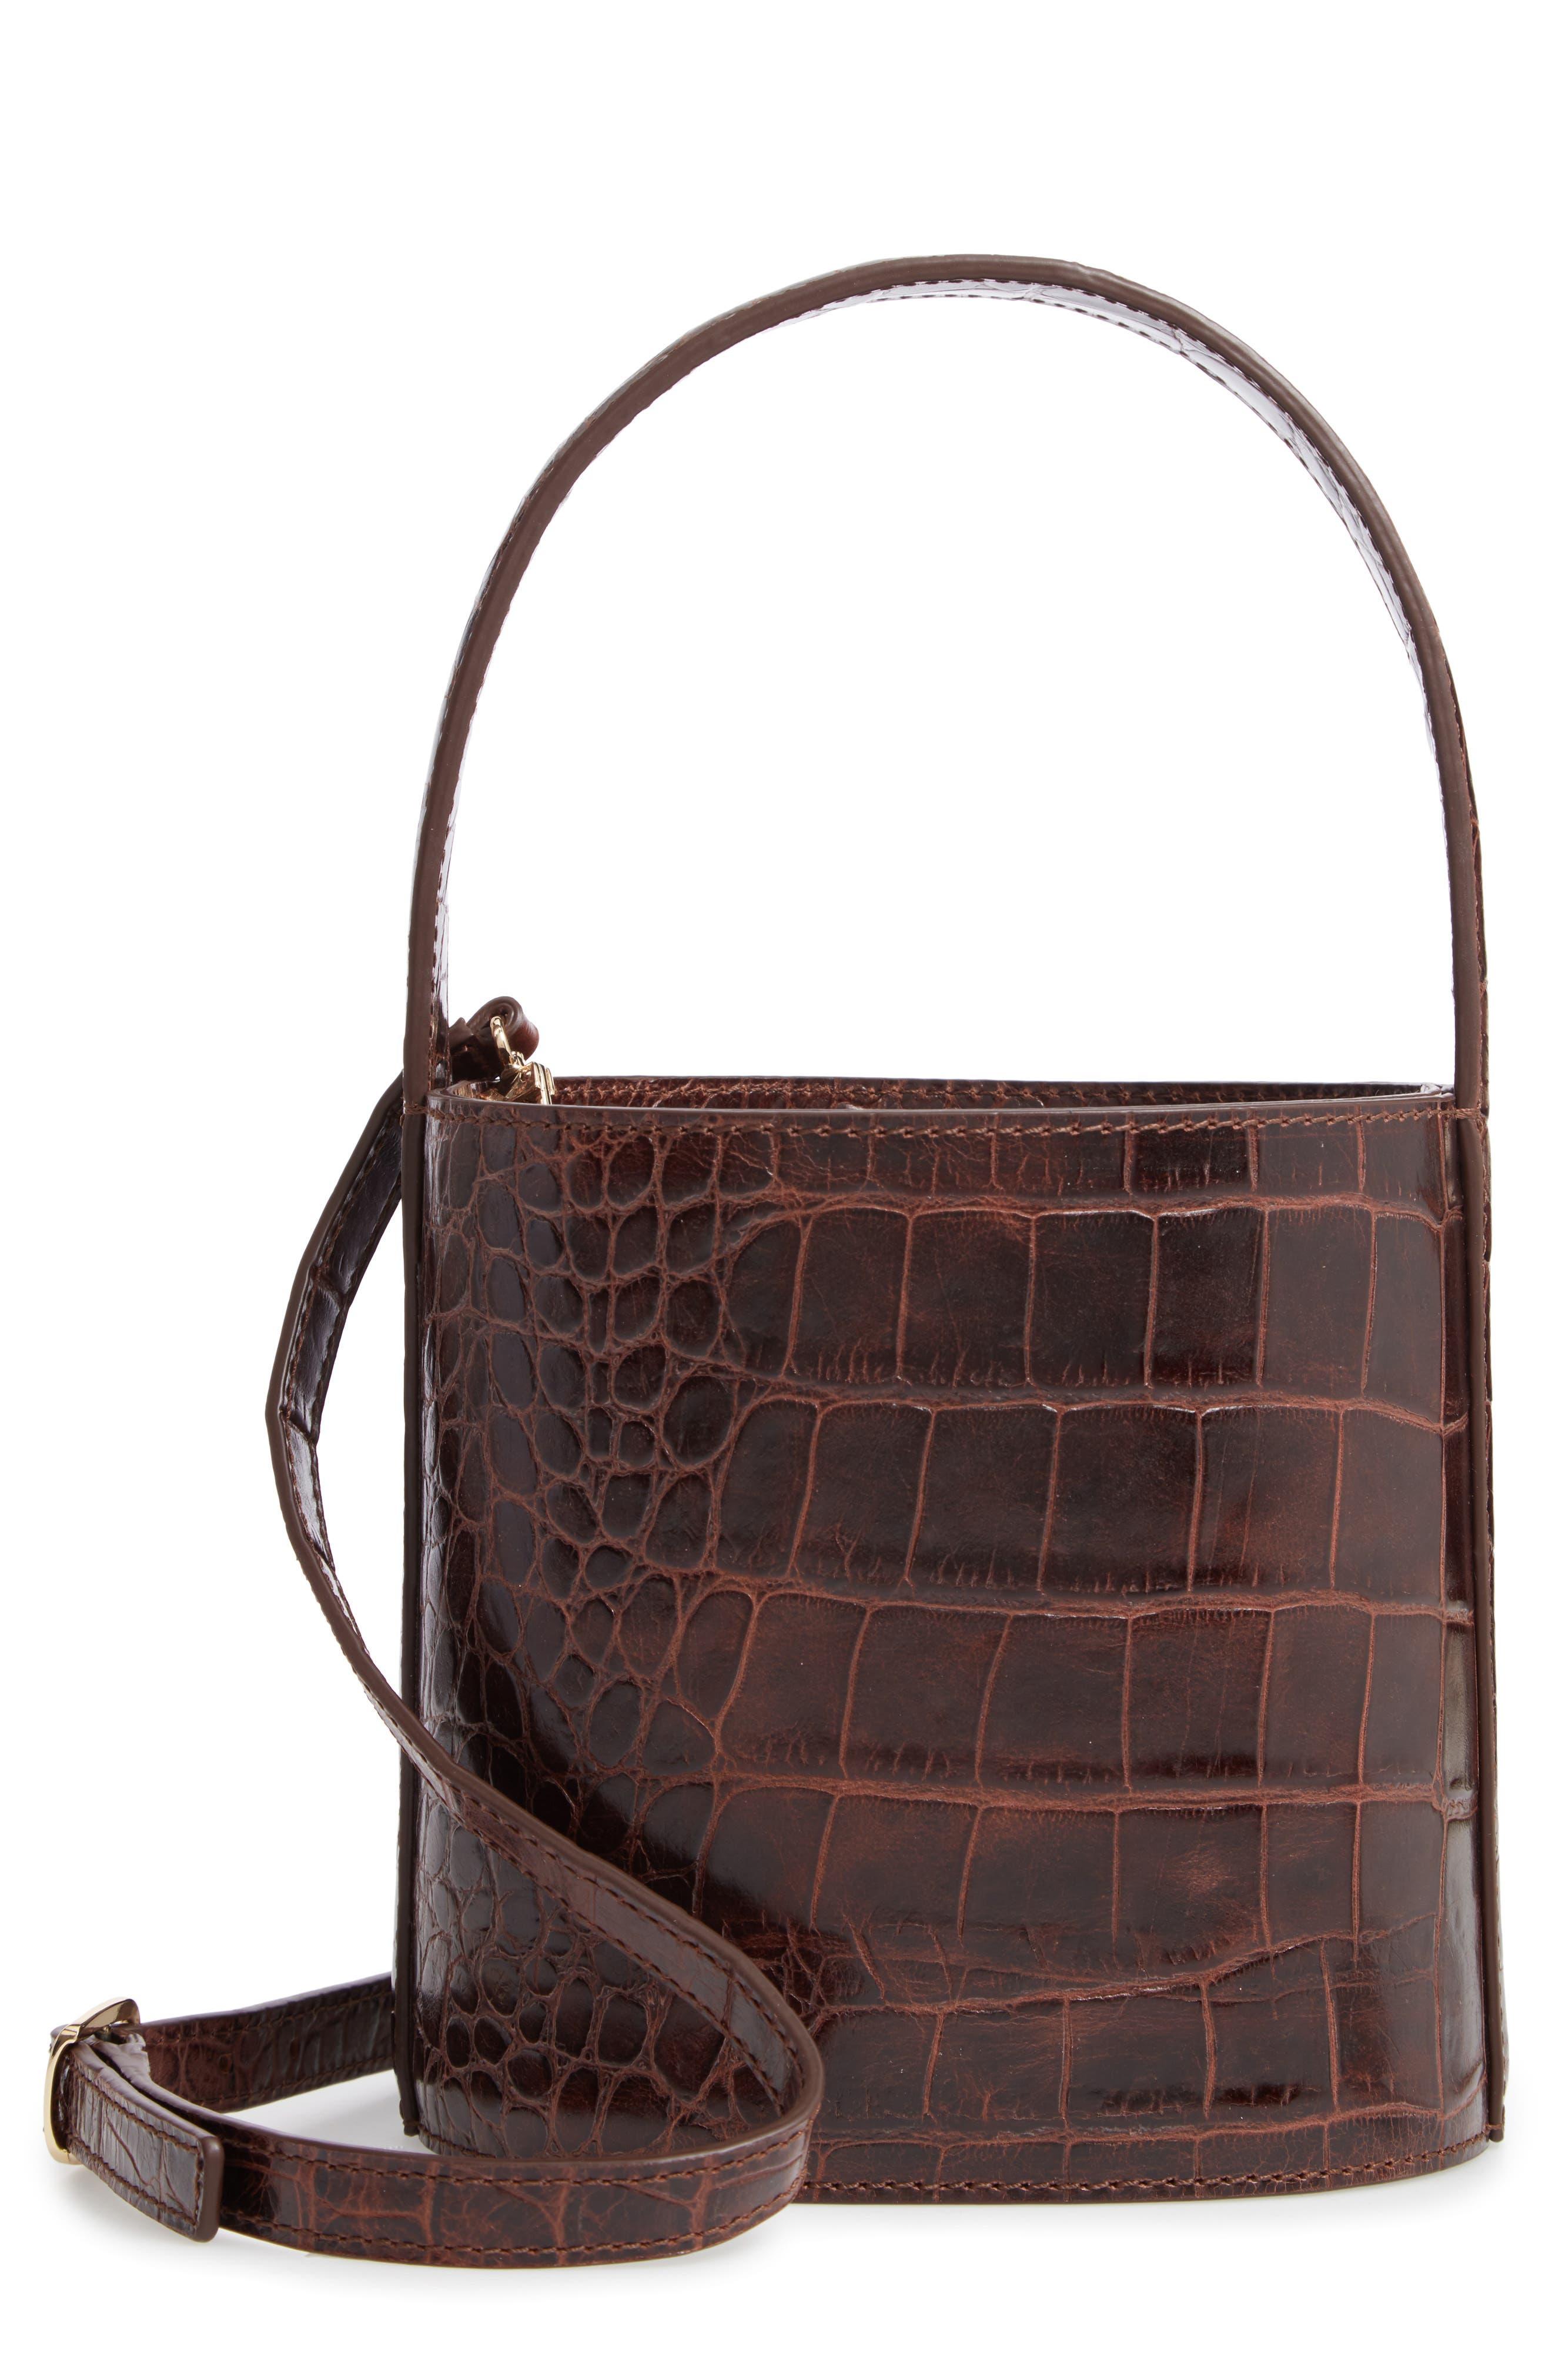 Bissett Croc Embossed Leather Bucket Bag - Brown